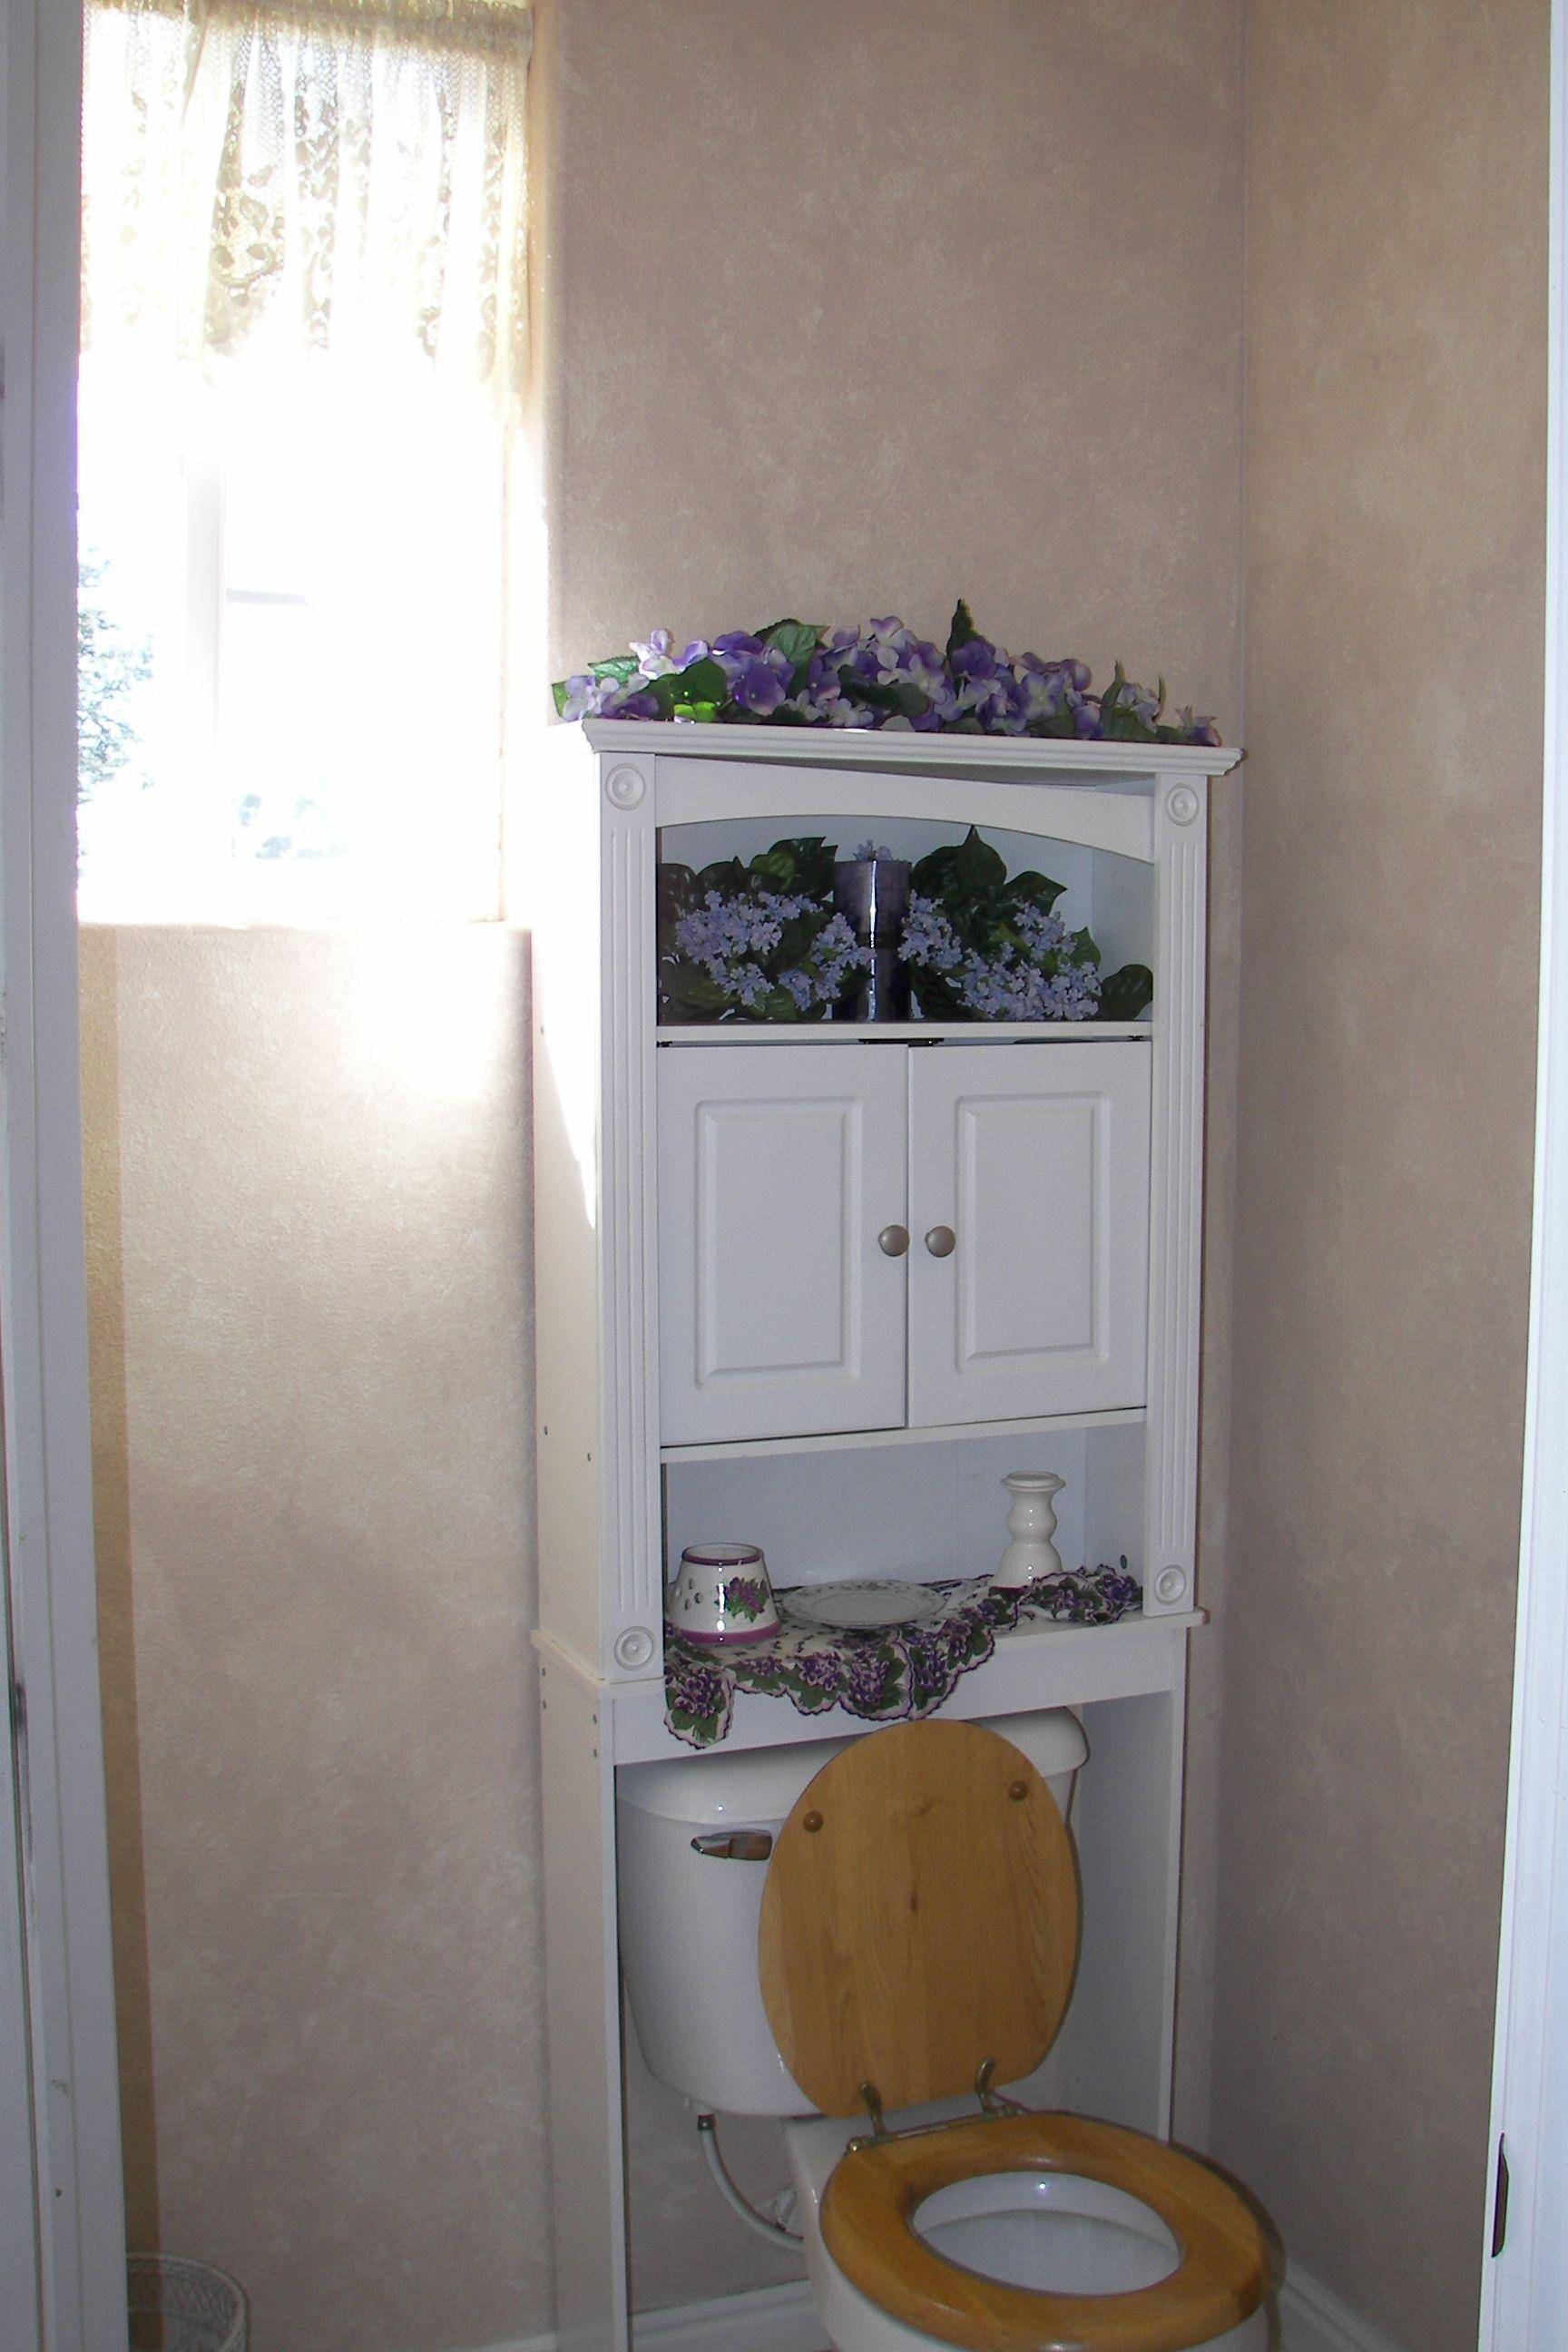 Lavender bathroom decor in enterprise utah my home for Lavender bathroom ideas design